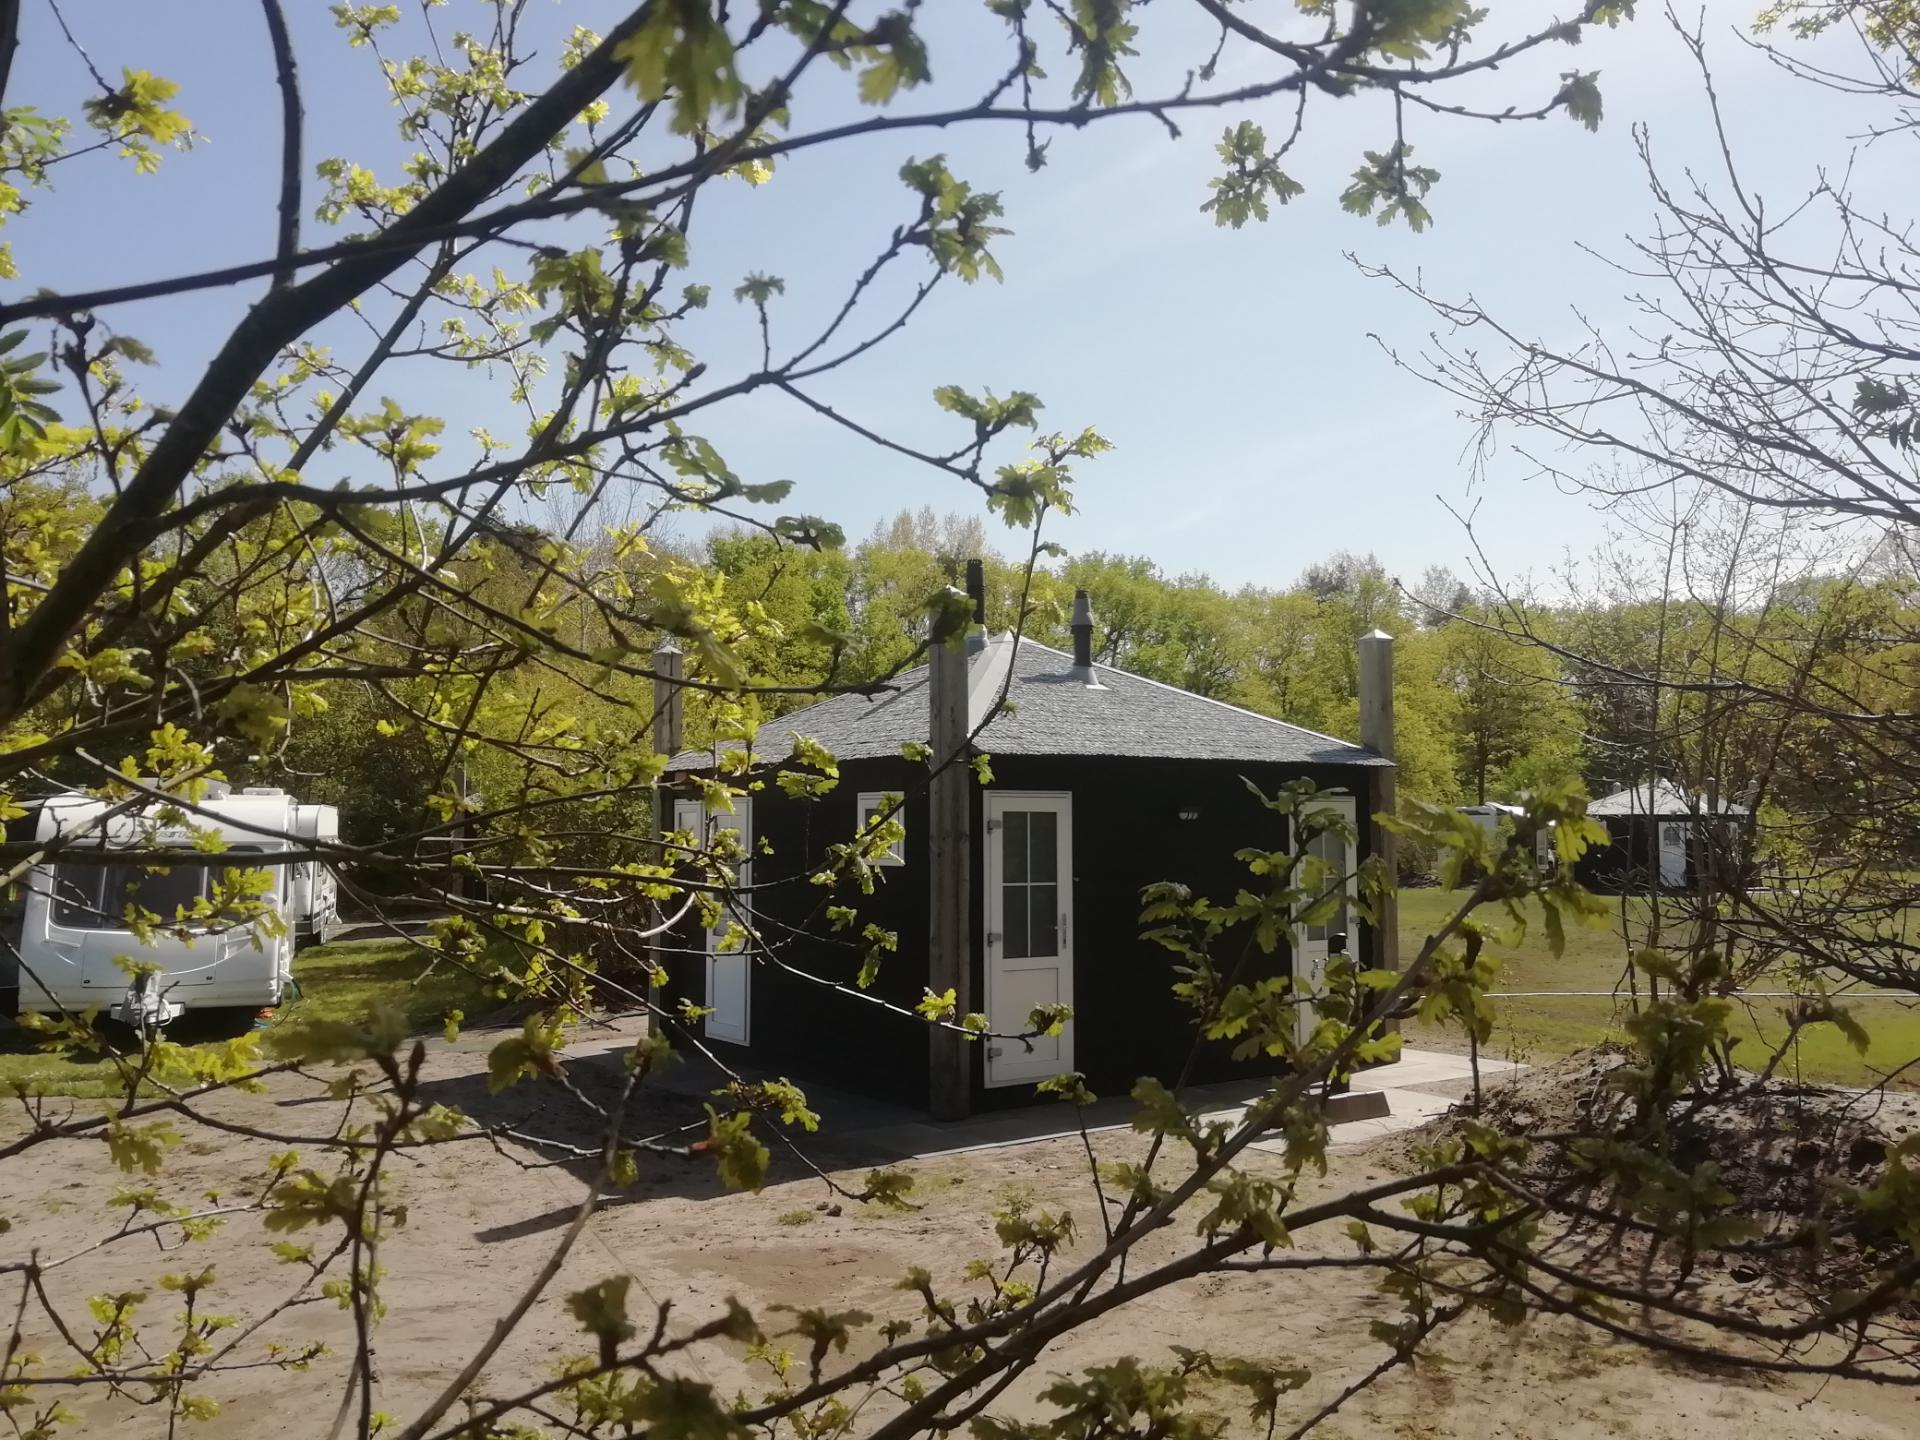 Camping Si-Es-An Camping met privé sanitair Balkbrug